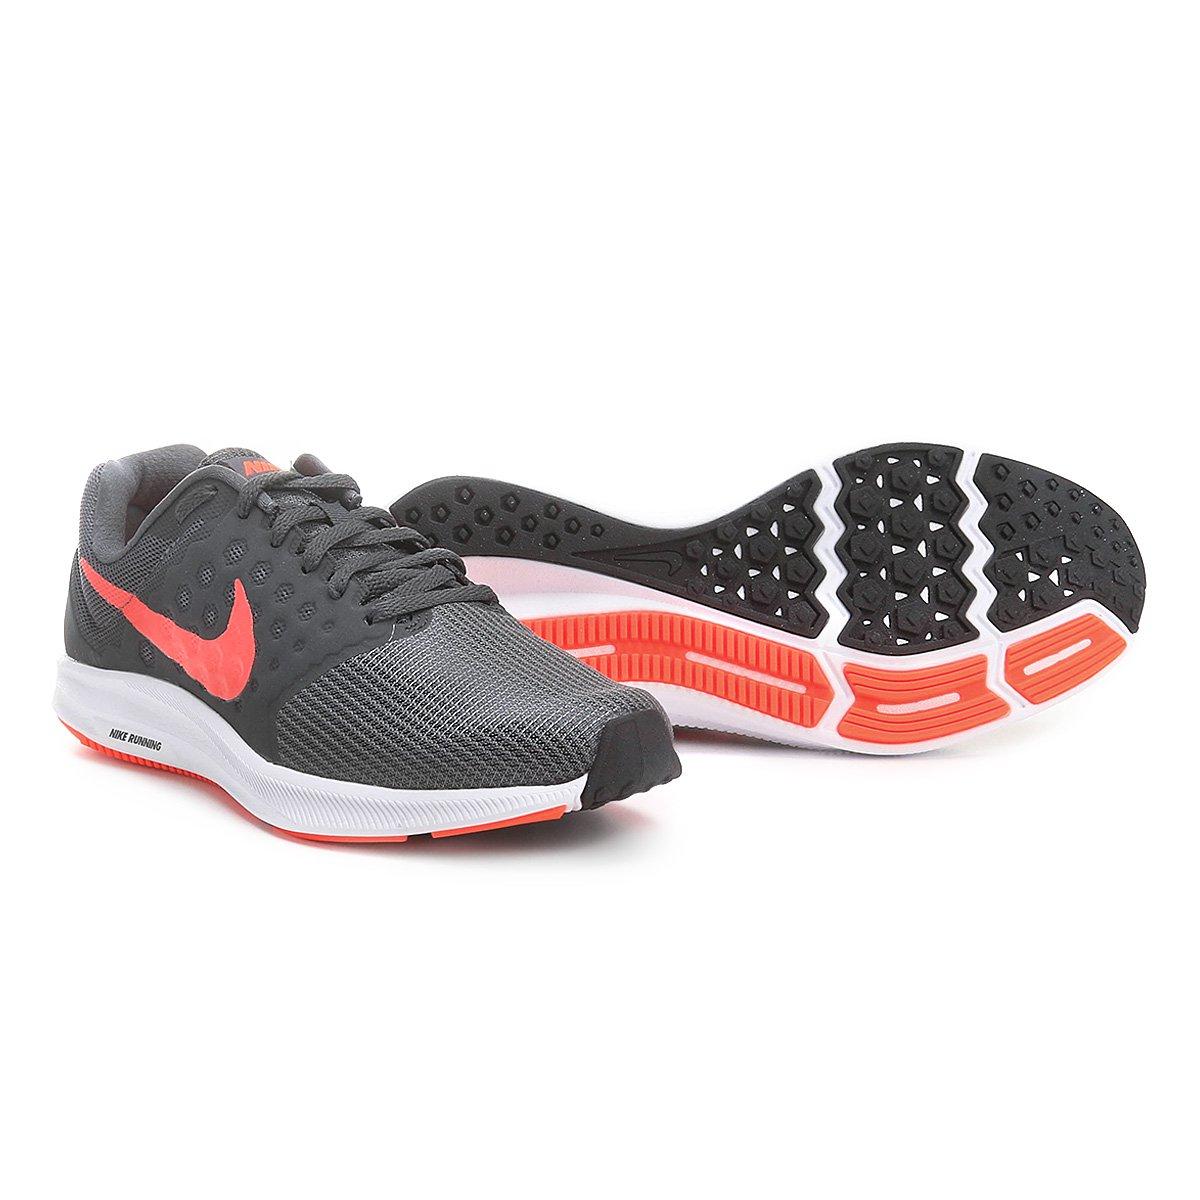 ce9a0c934f Tênis Nike Downshifter 7 Masculino - Compre Agora